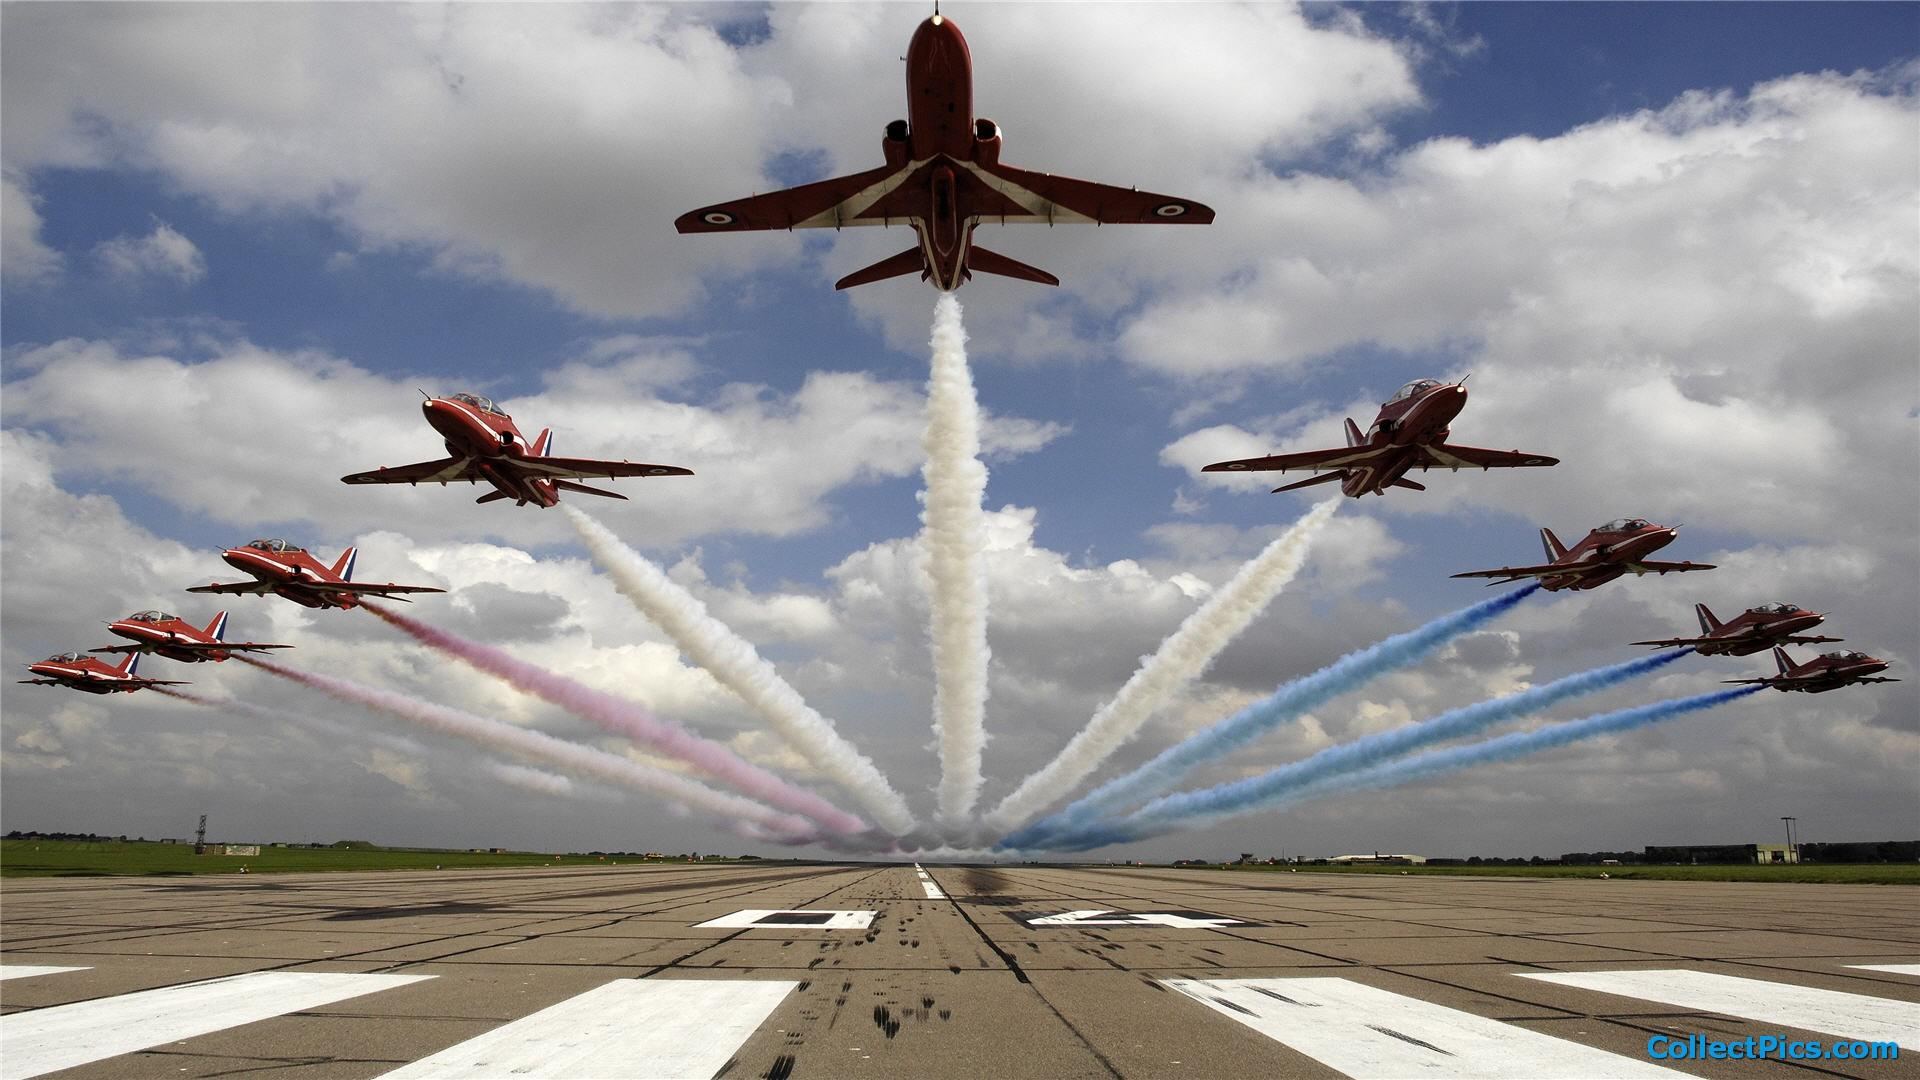 Jf 17 Thunder Hd Wallpapers Pakistan Air Force A Symbol Of Excellence Saqib Nazir